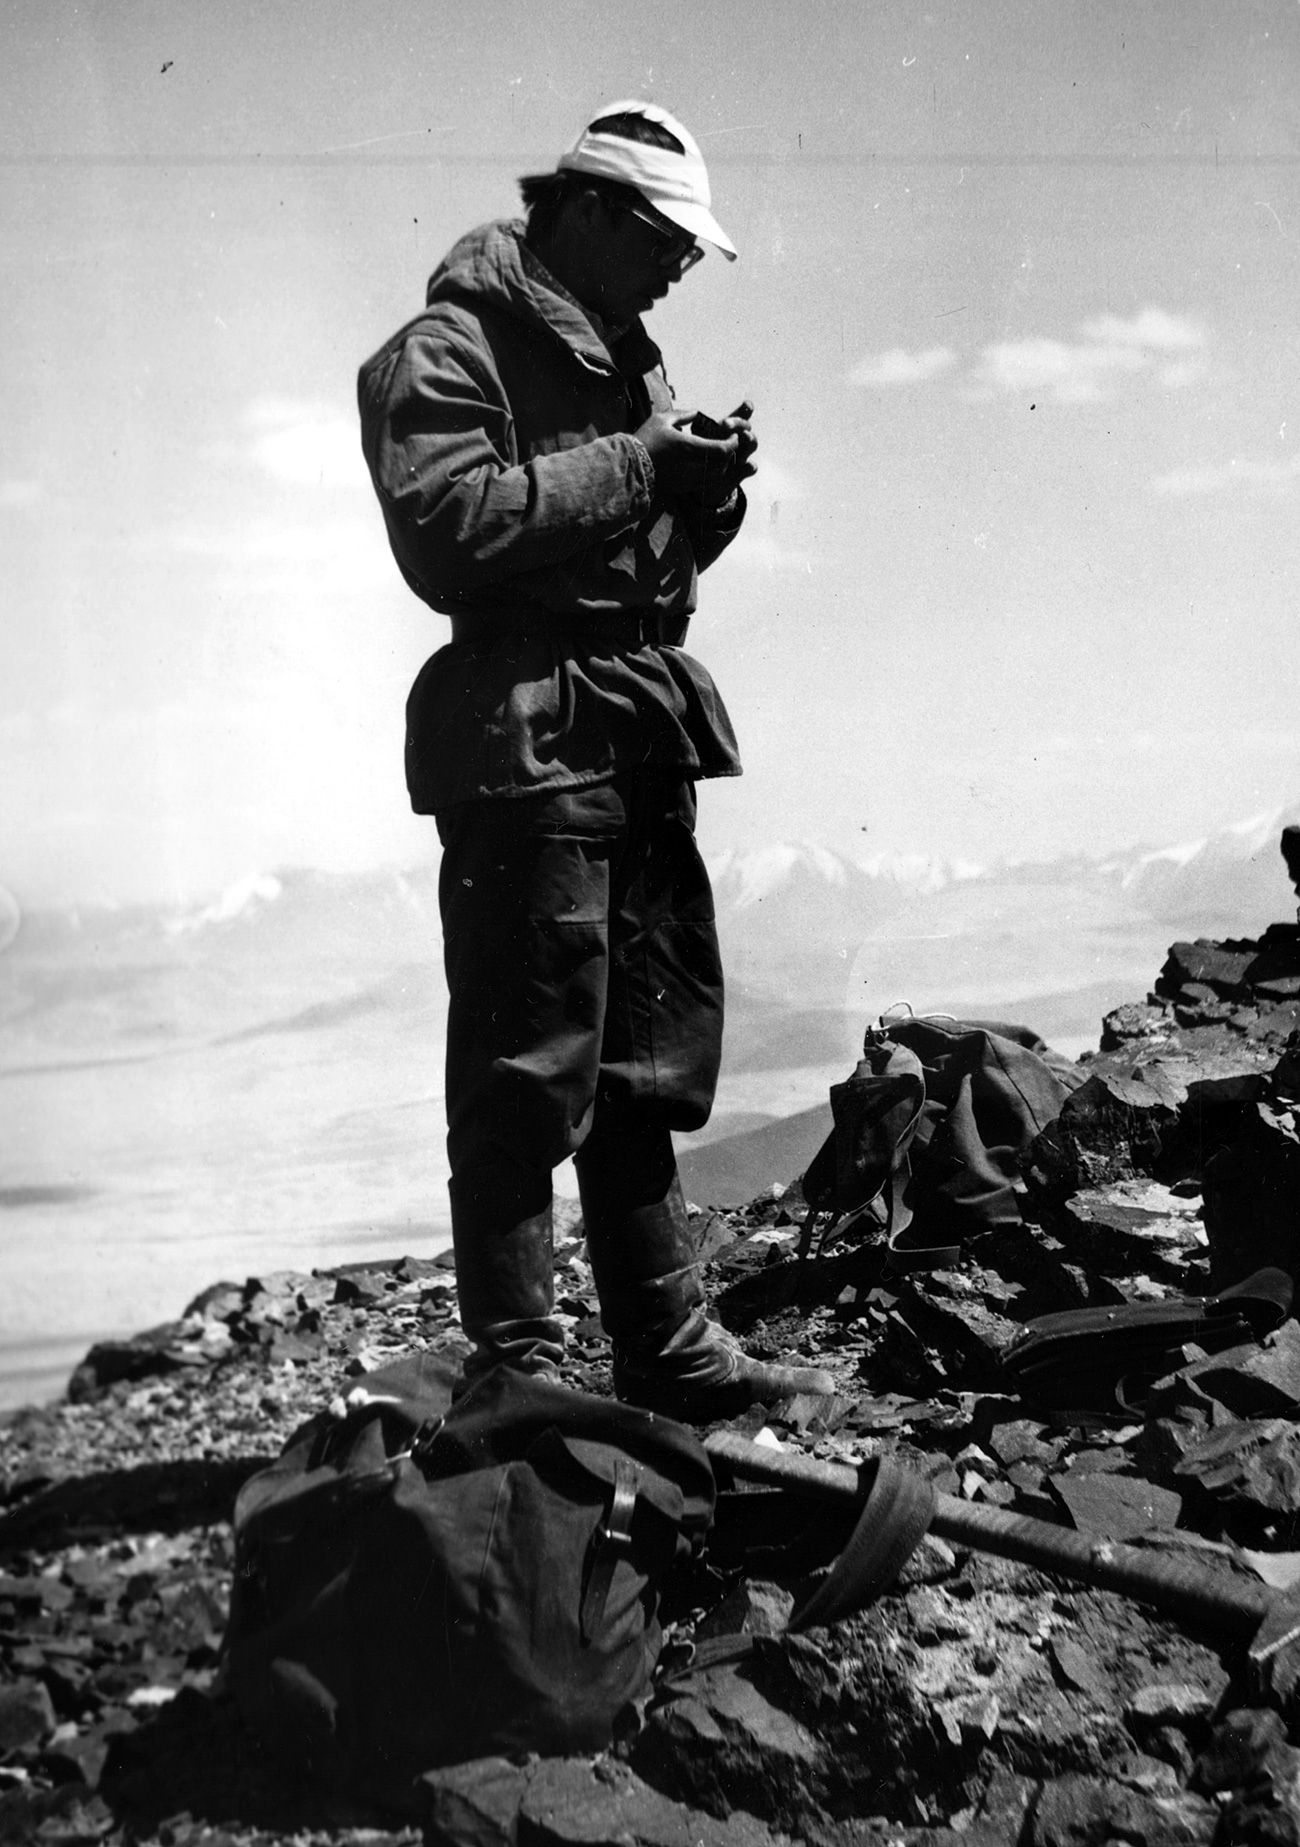 Geolog v planinah, 1982. Osebni arhiv dr. Vladimirja Vladimirova